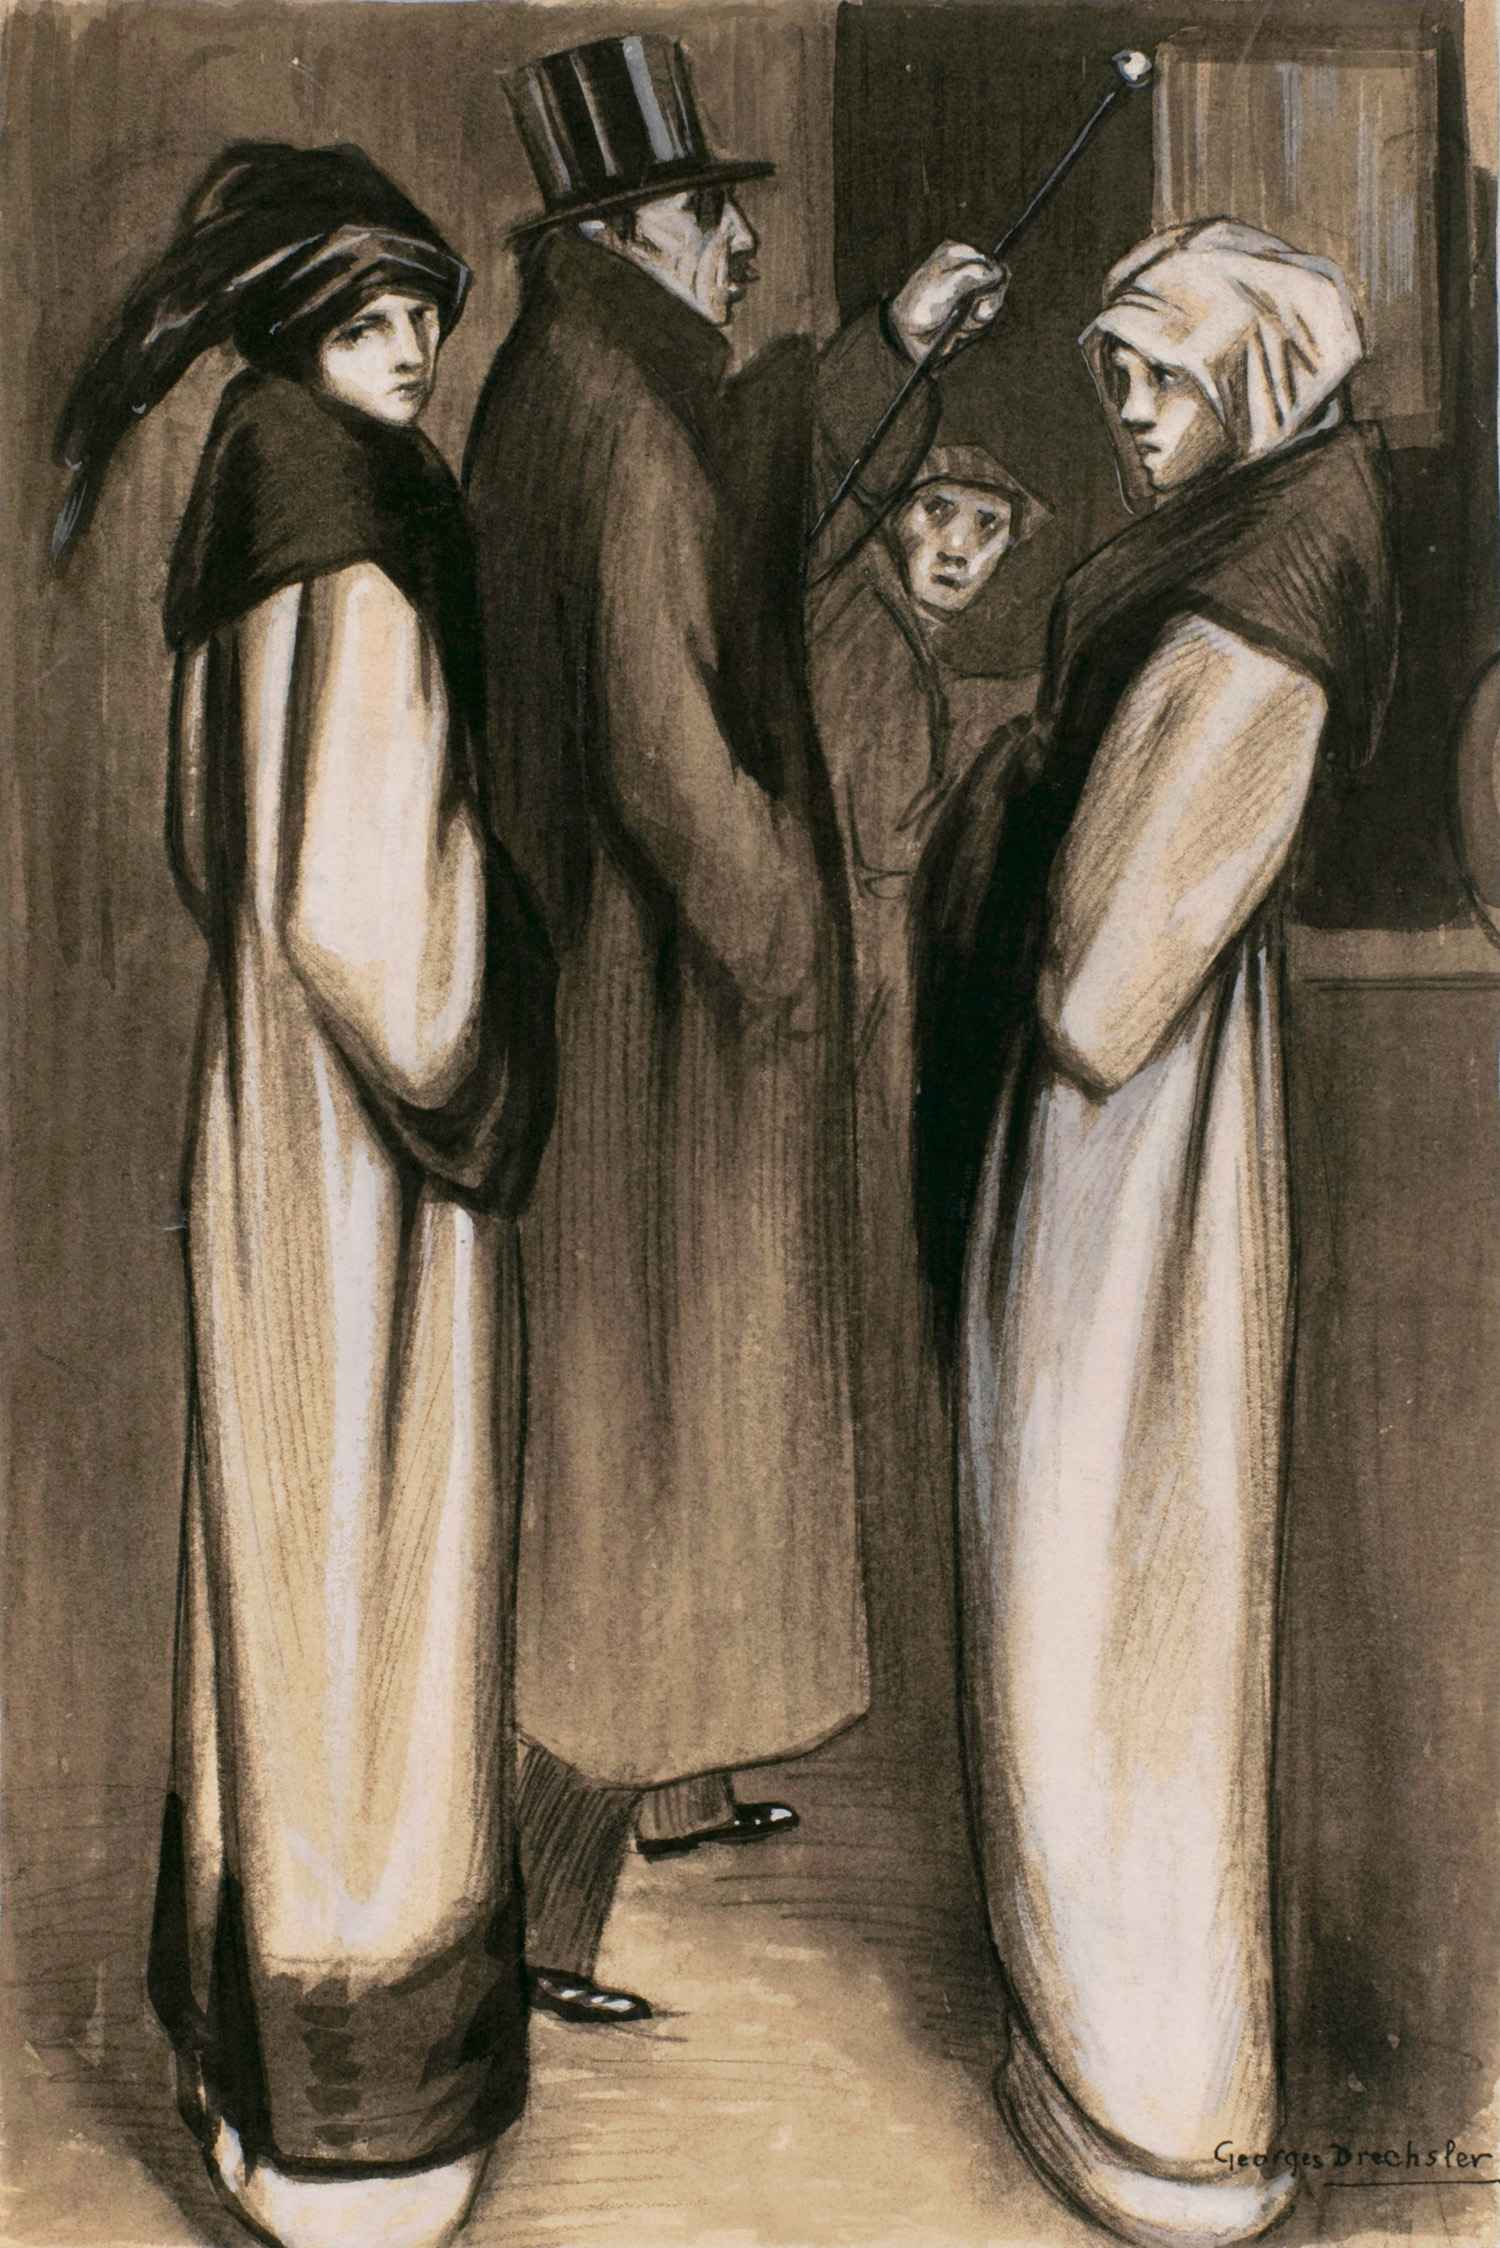 La servante | Georges Drechsler | La servante